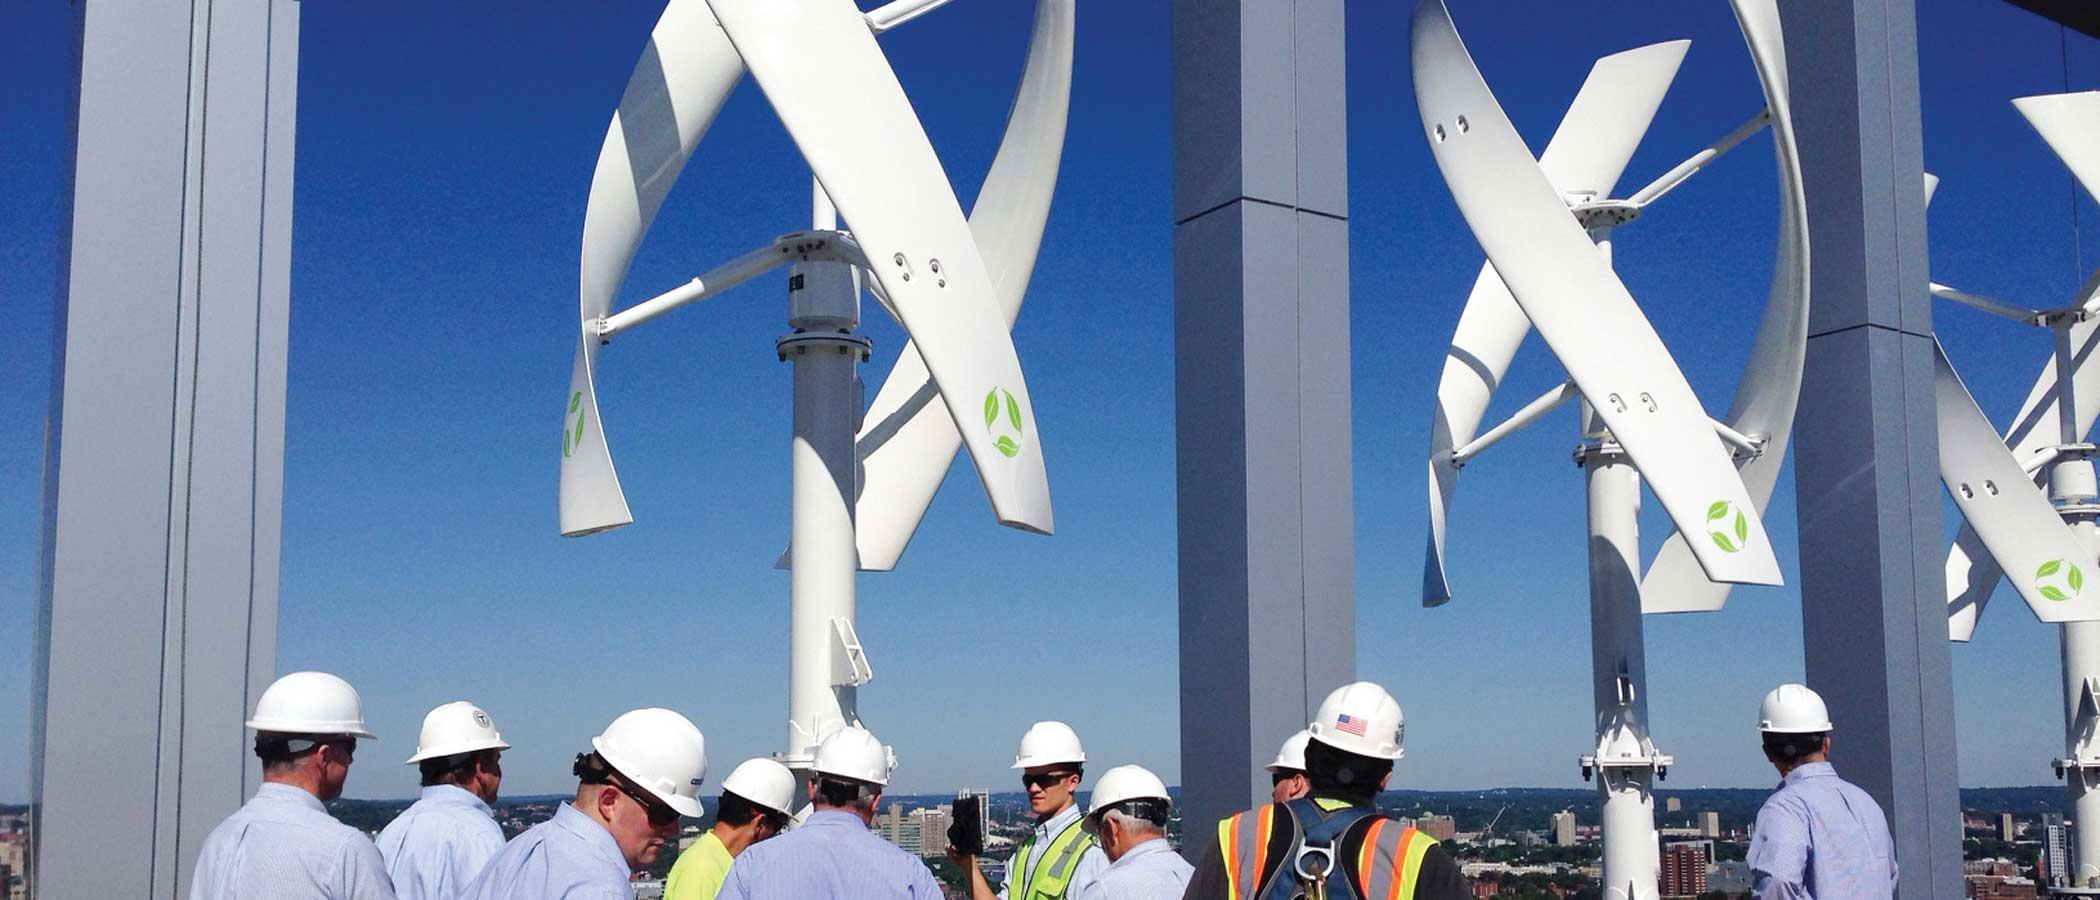 Micro wind turbines atop a building.